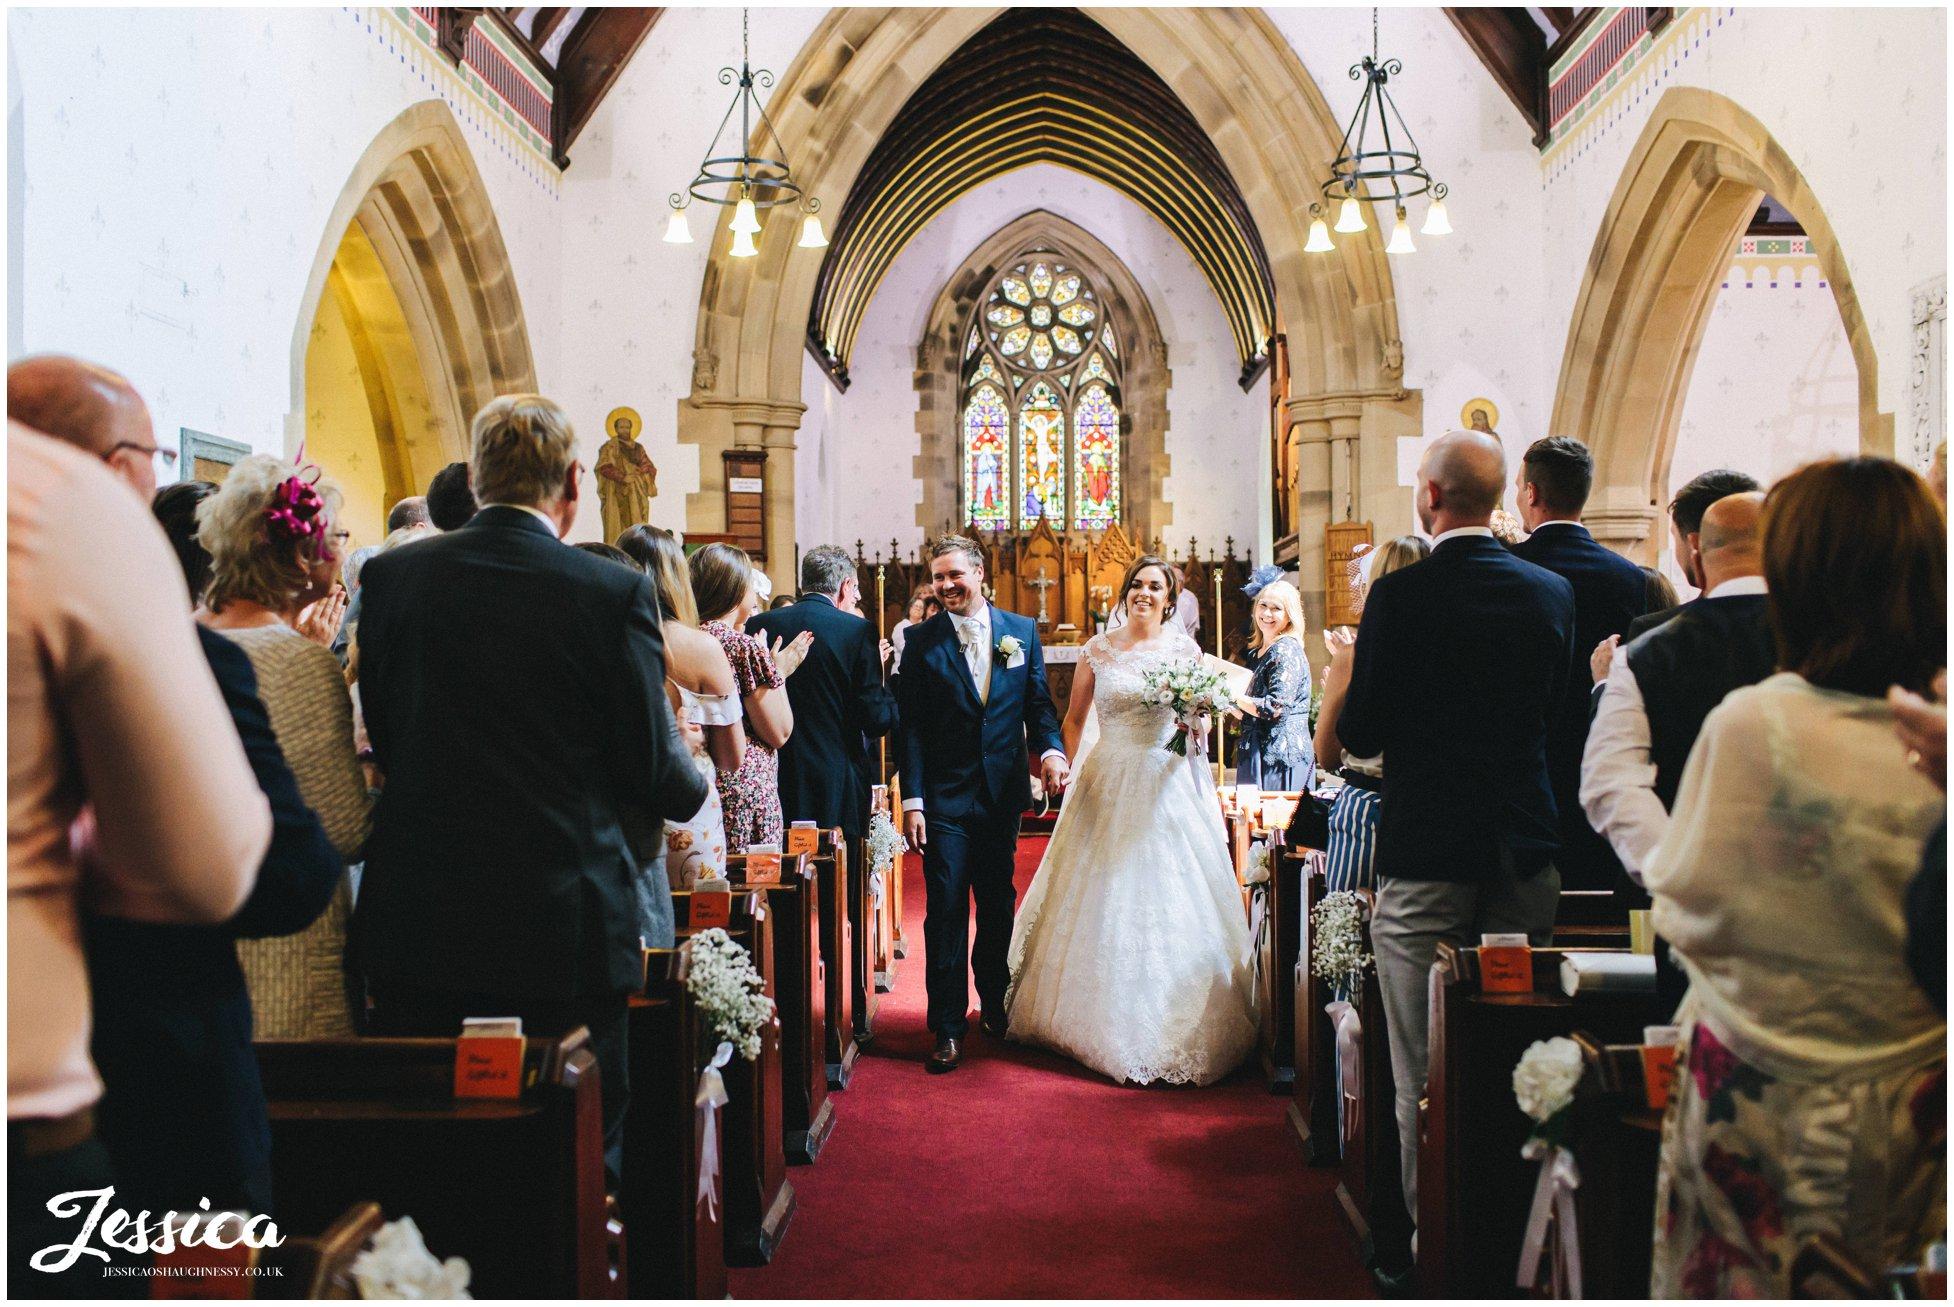 Bride & Groom walk down the aisle as husband and wife